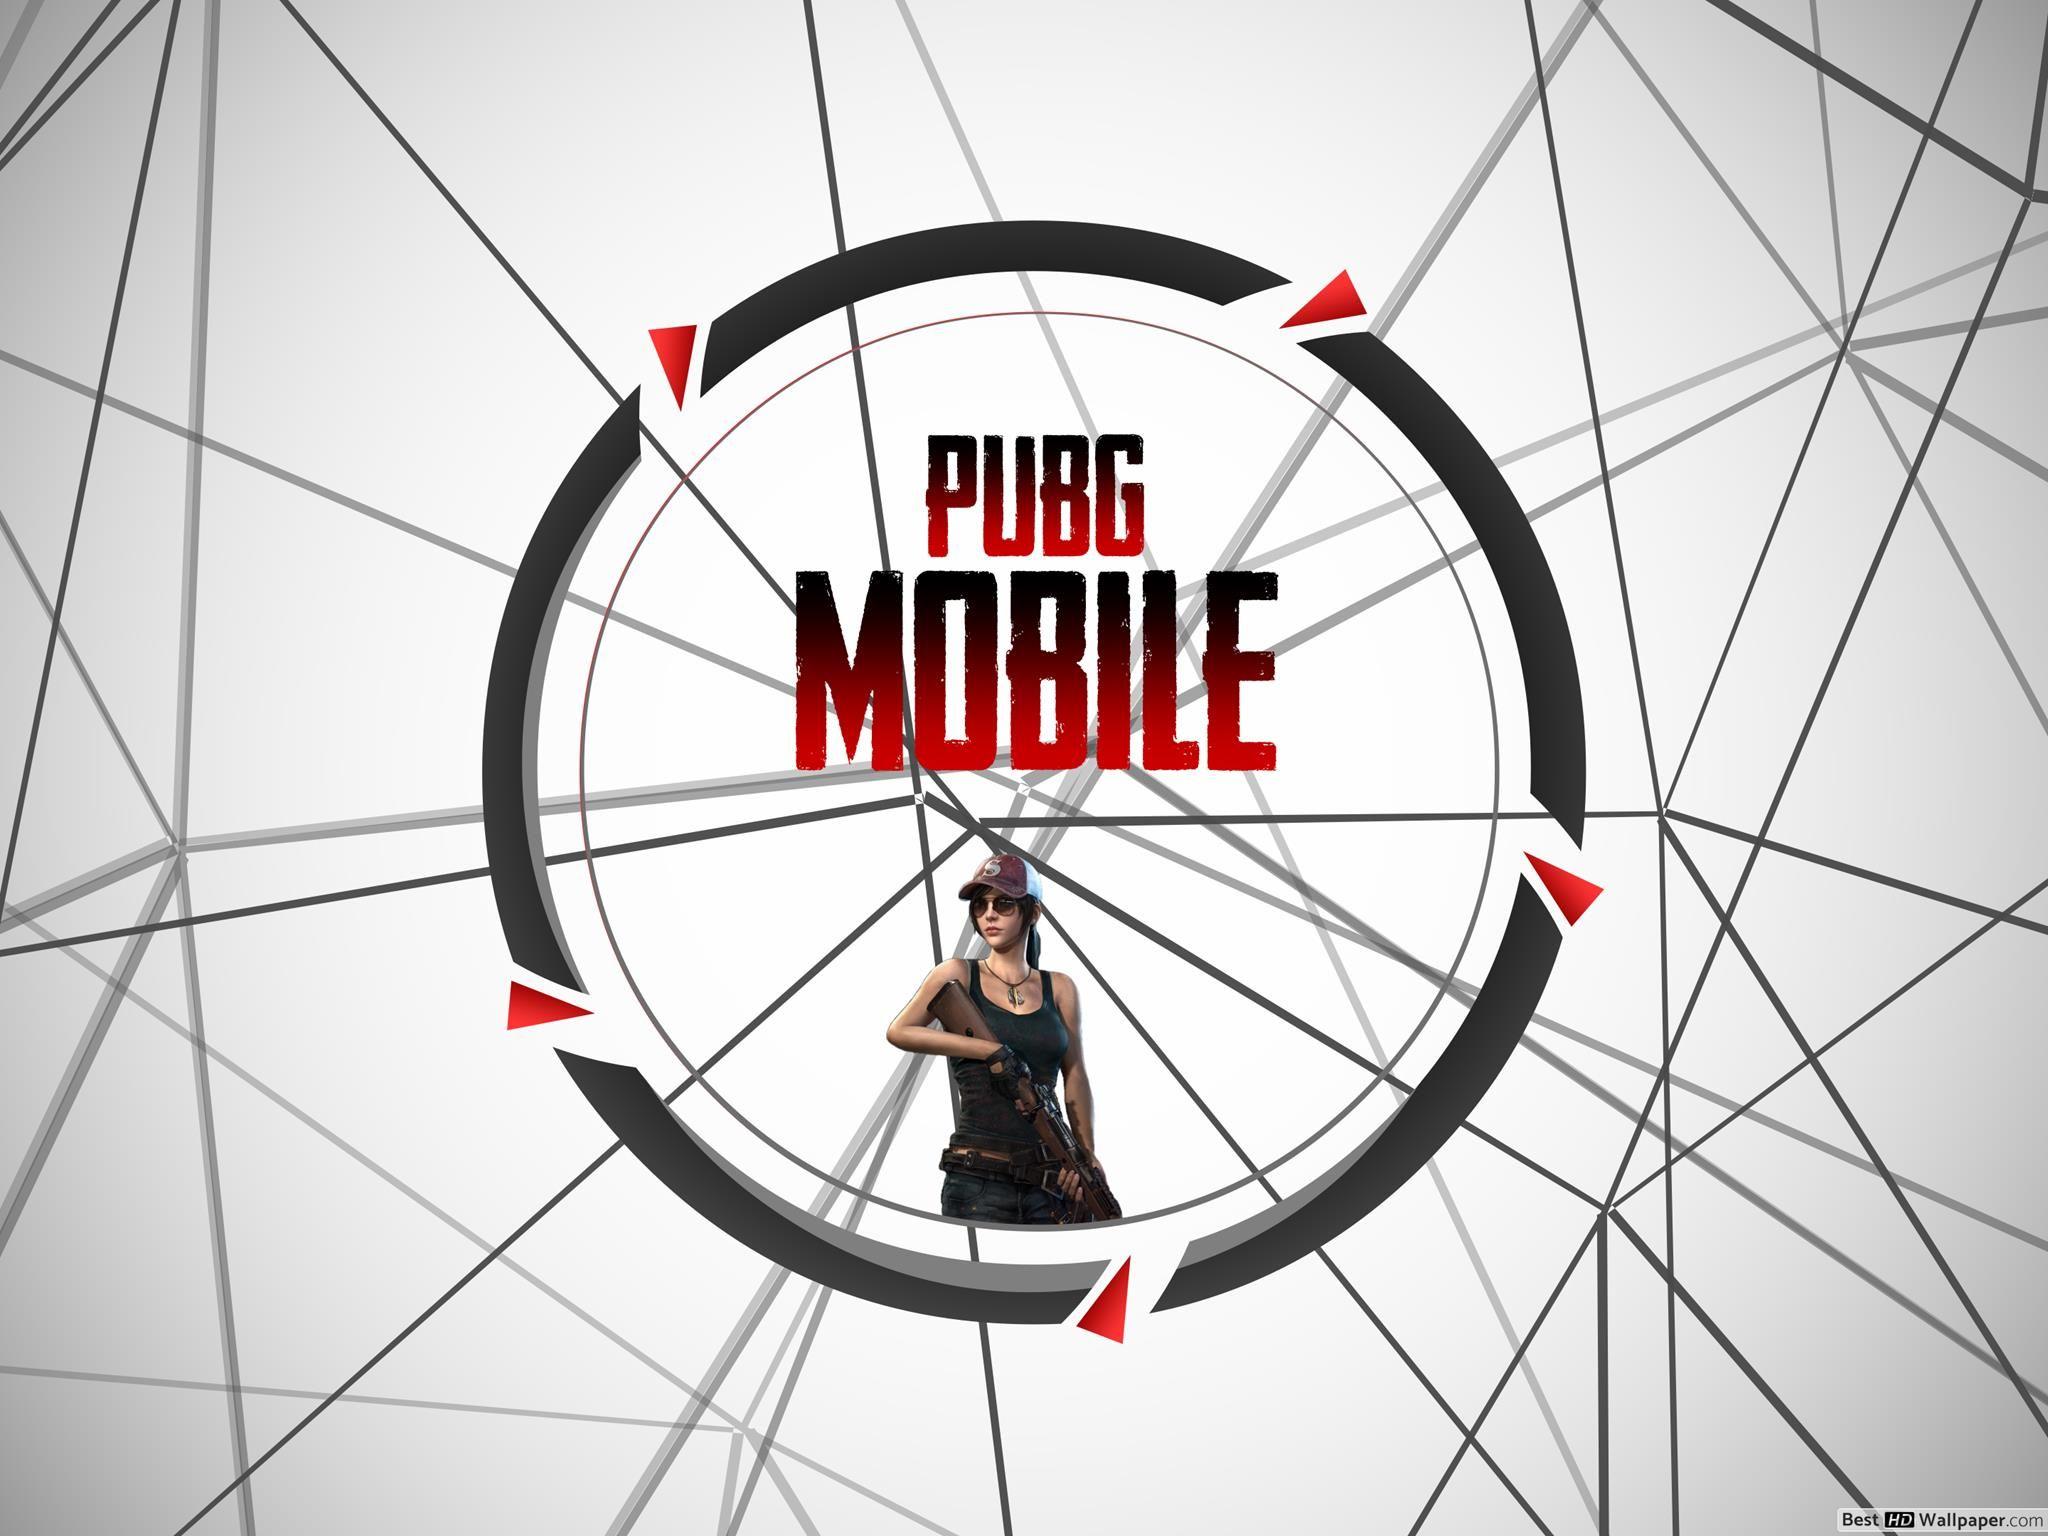 Pubg Mobile Hd Wallpaper Pubg Mobile Hd Wallpaper ...